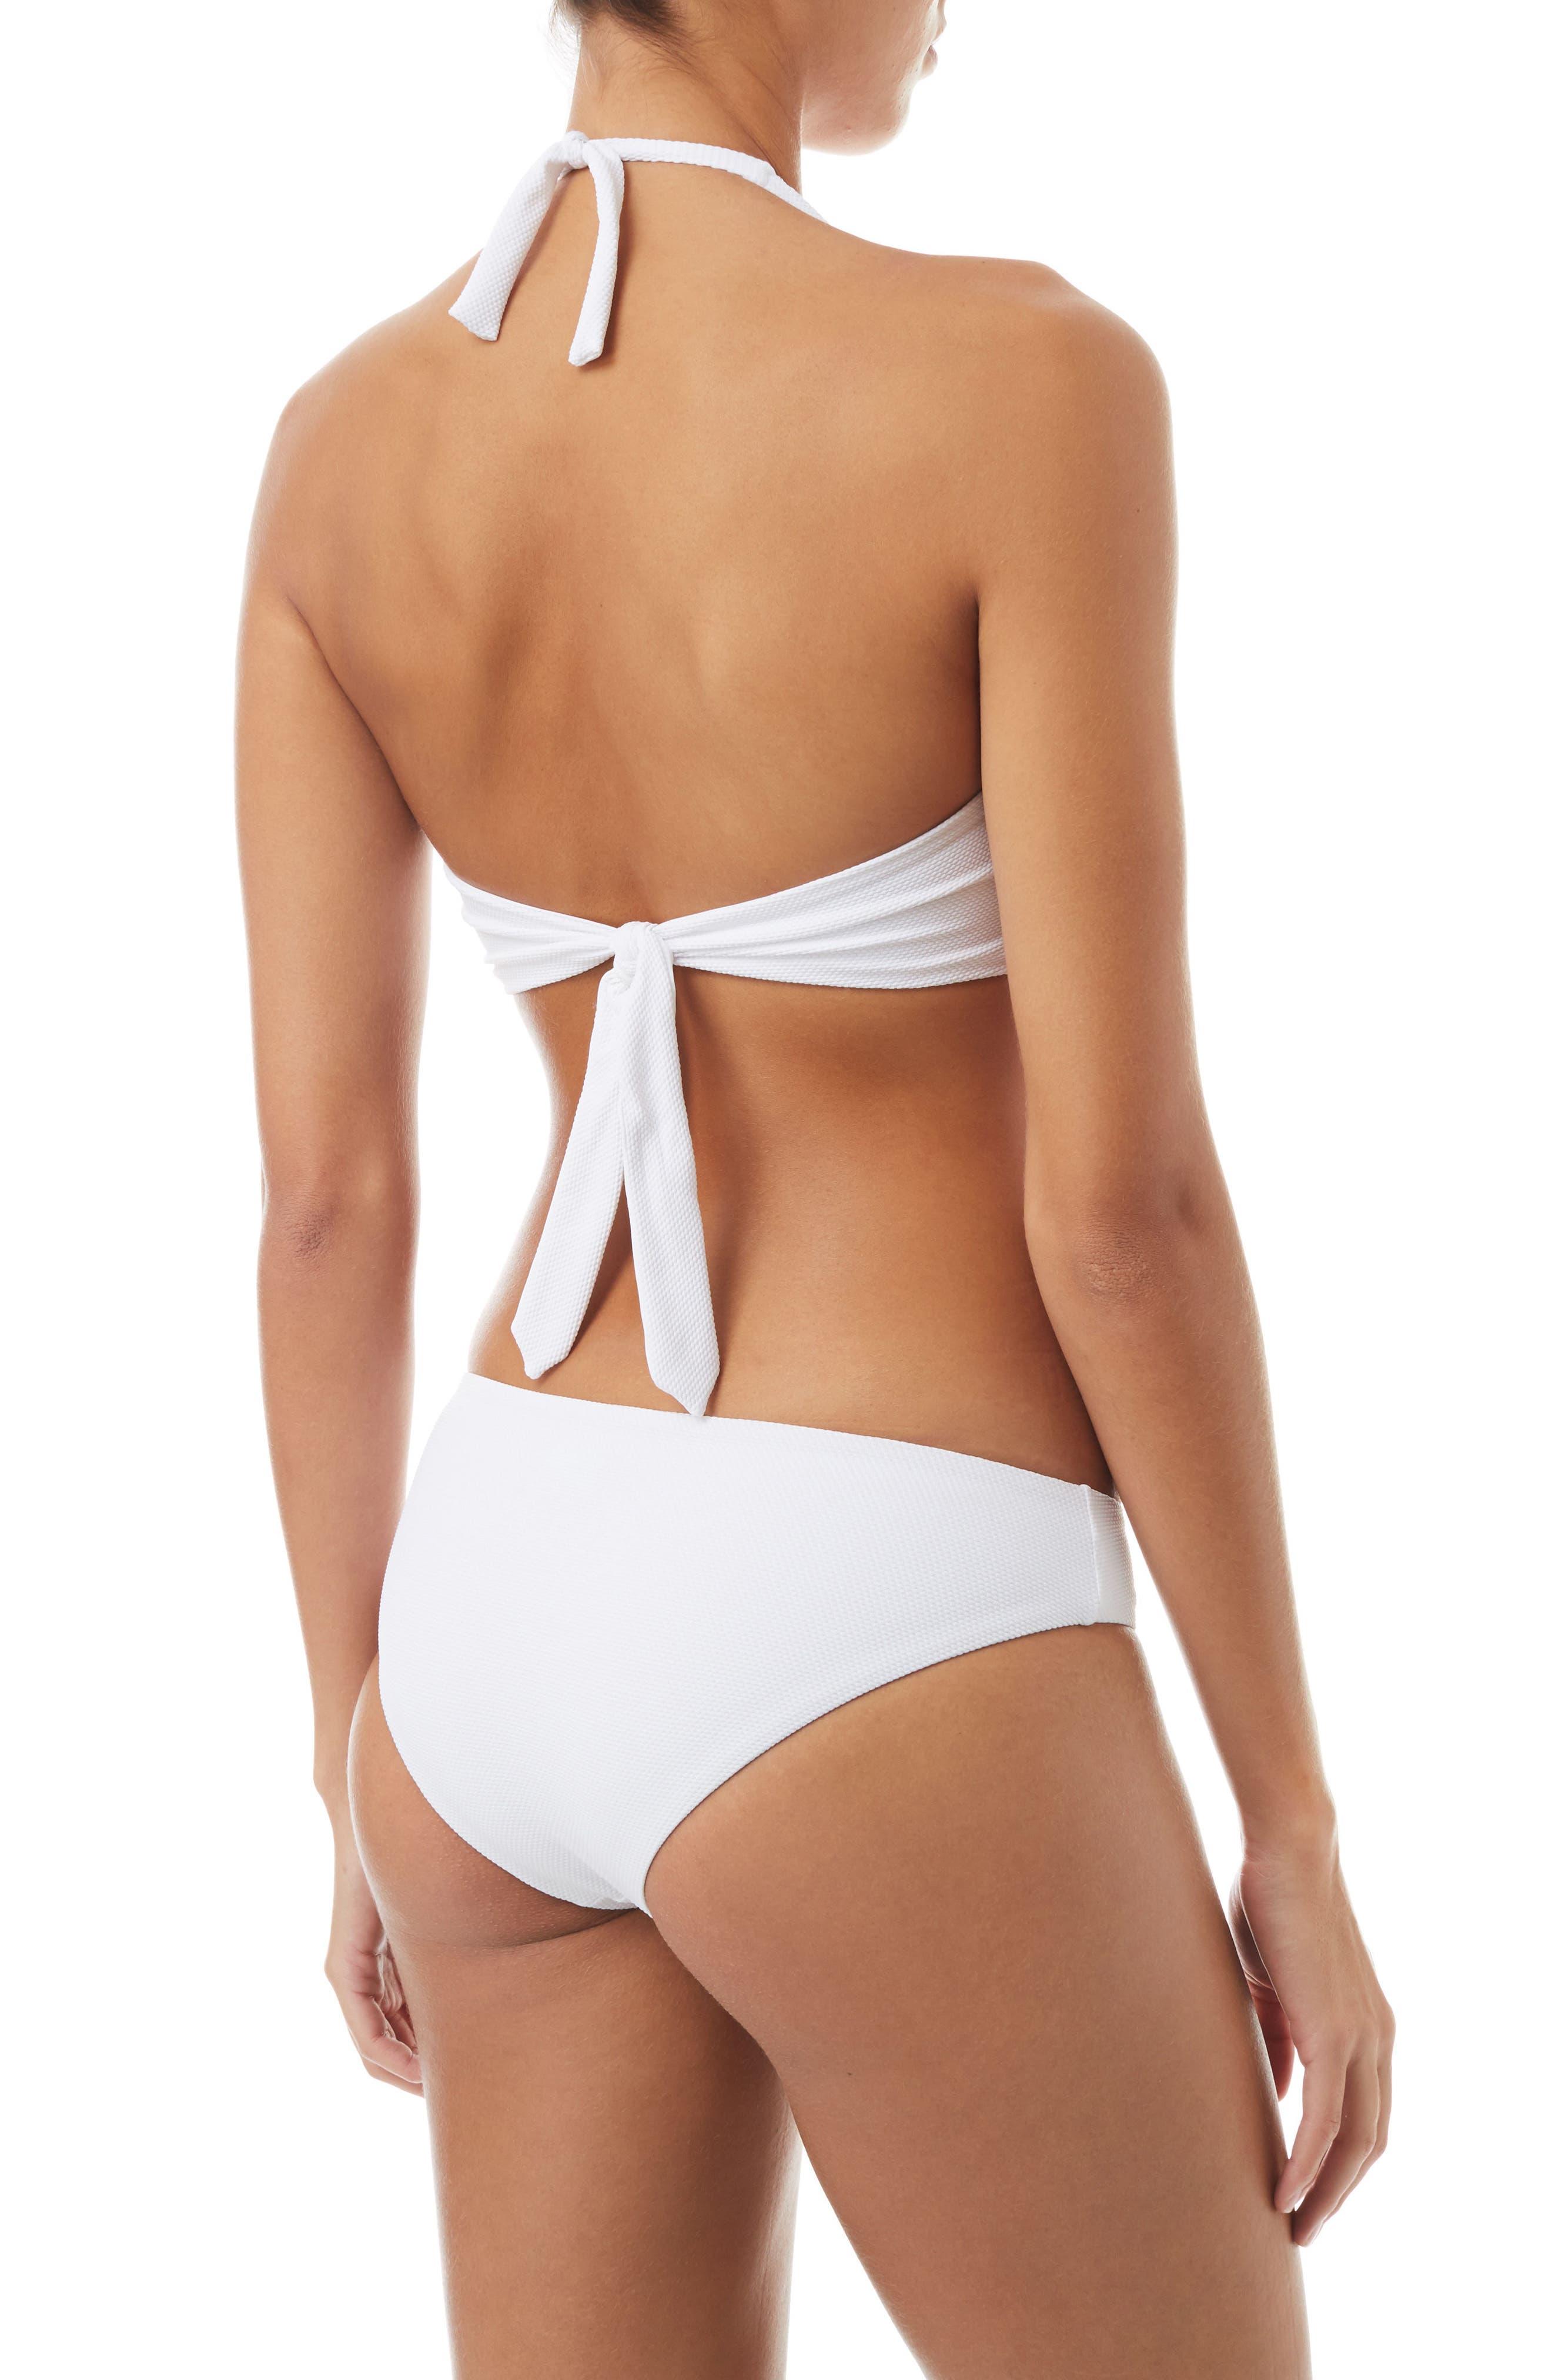 Africa Bikini Bottoms,                             Alternate thumbnail 4, color,                             Pique White